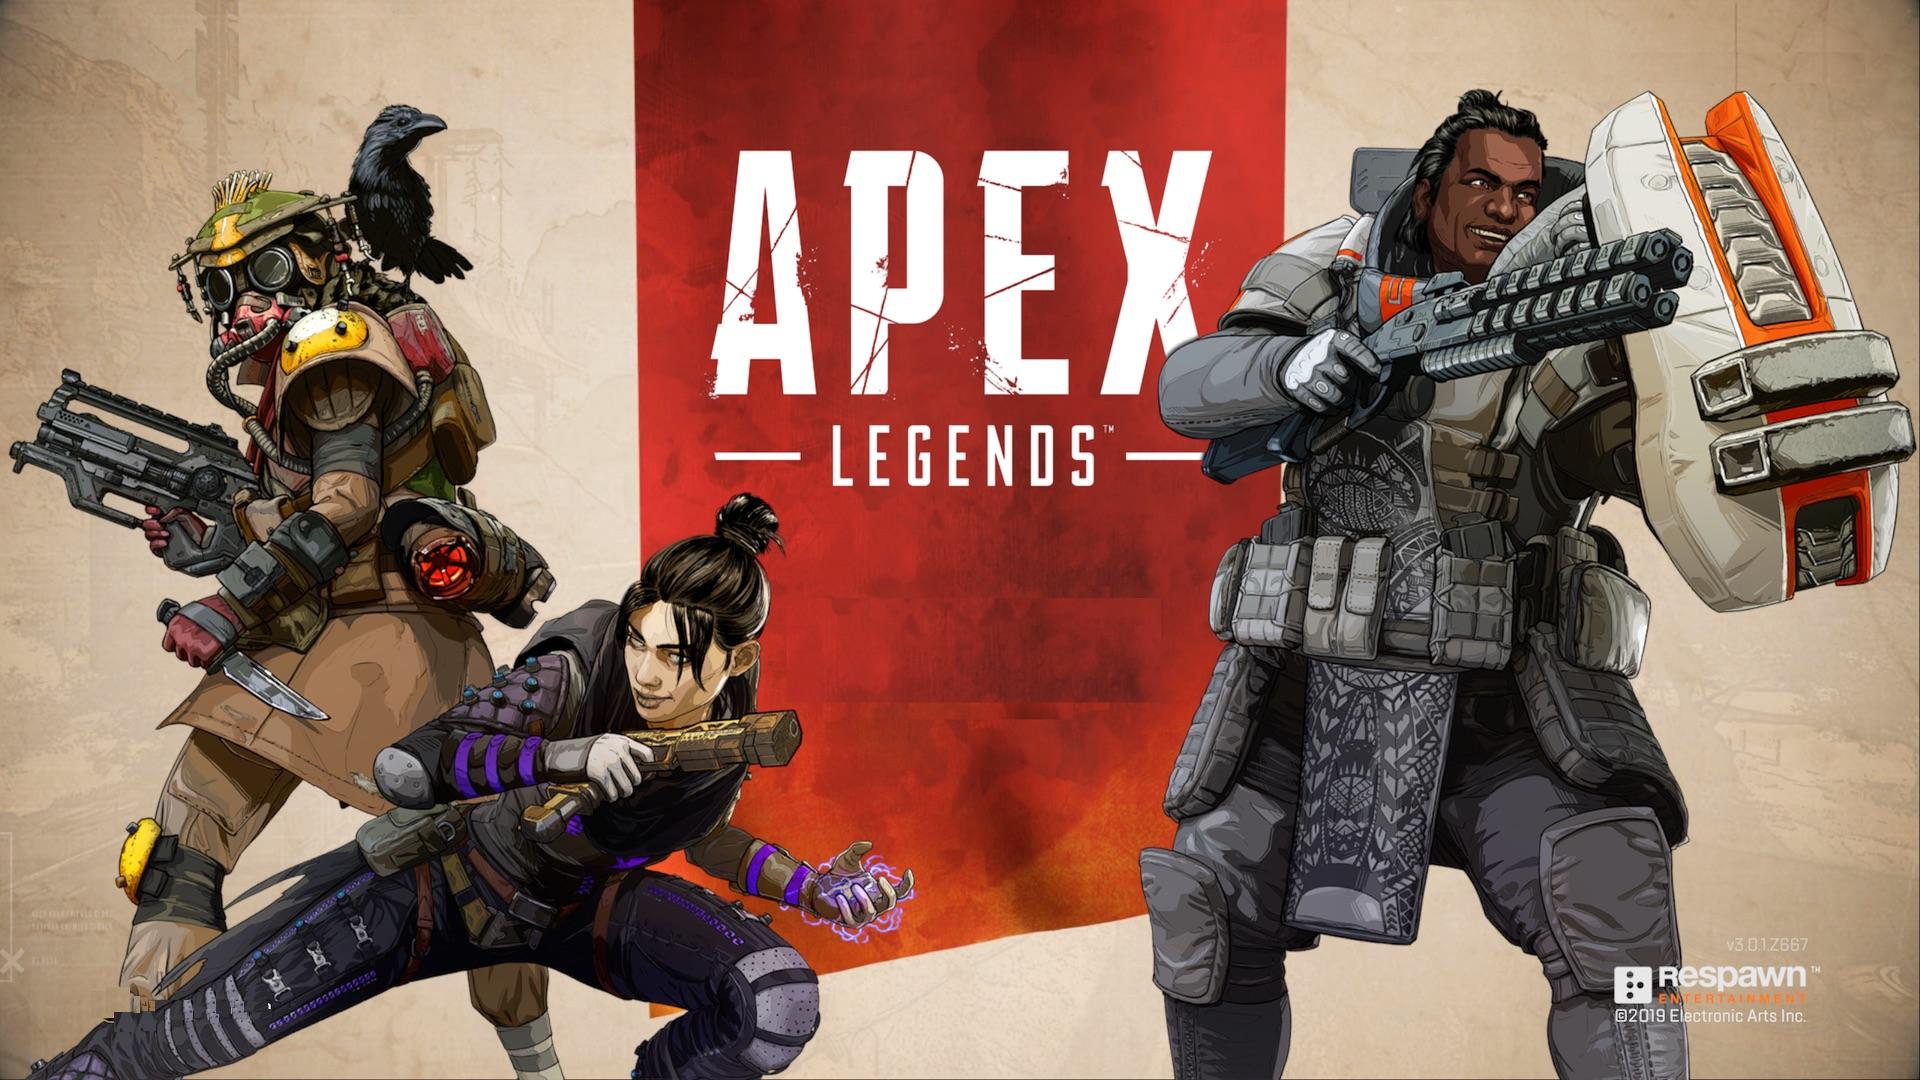 《Apex 英雄》:《泰坦天降》世界观下的「吃鸡」新作